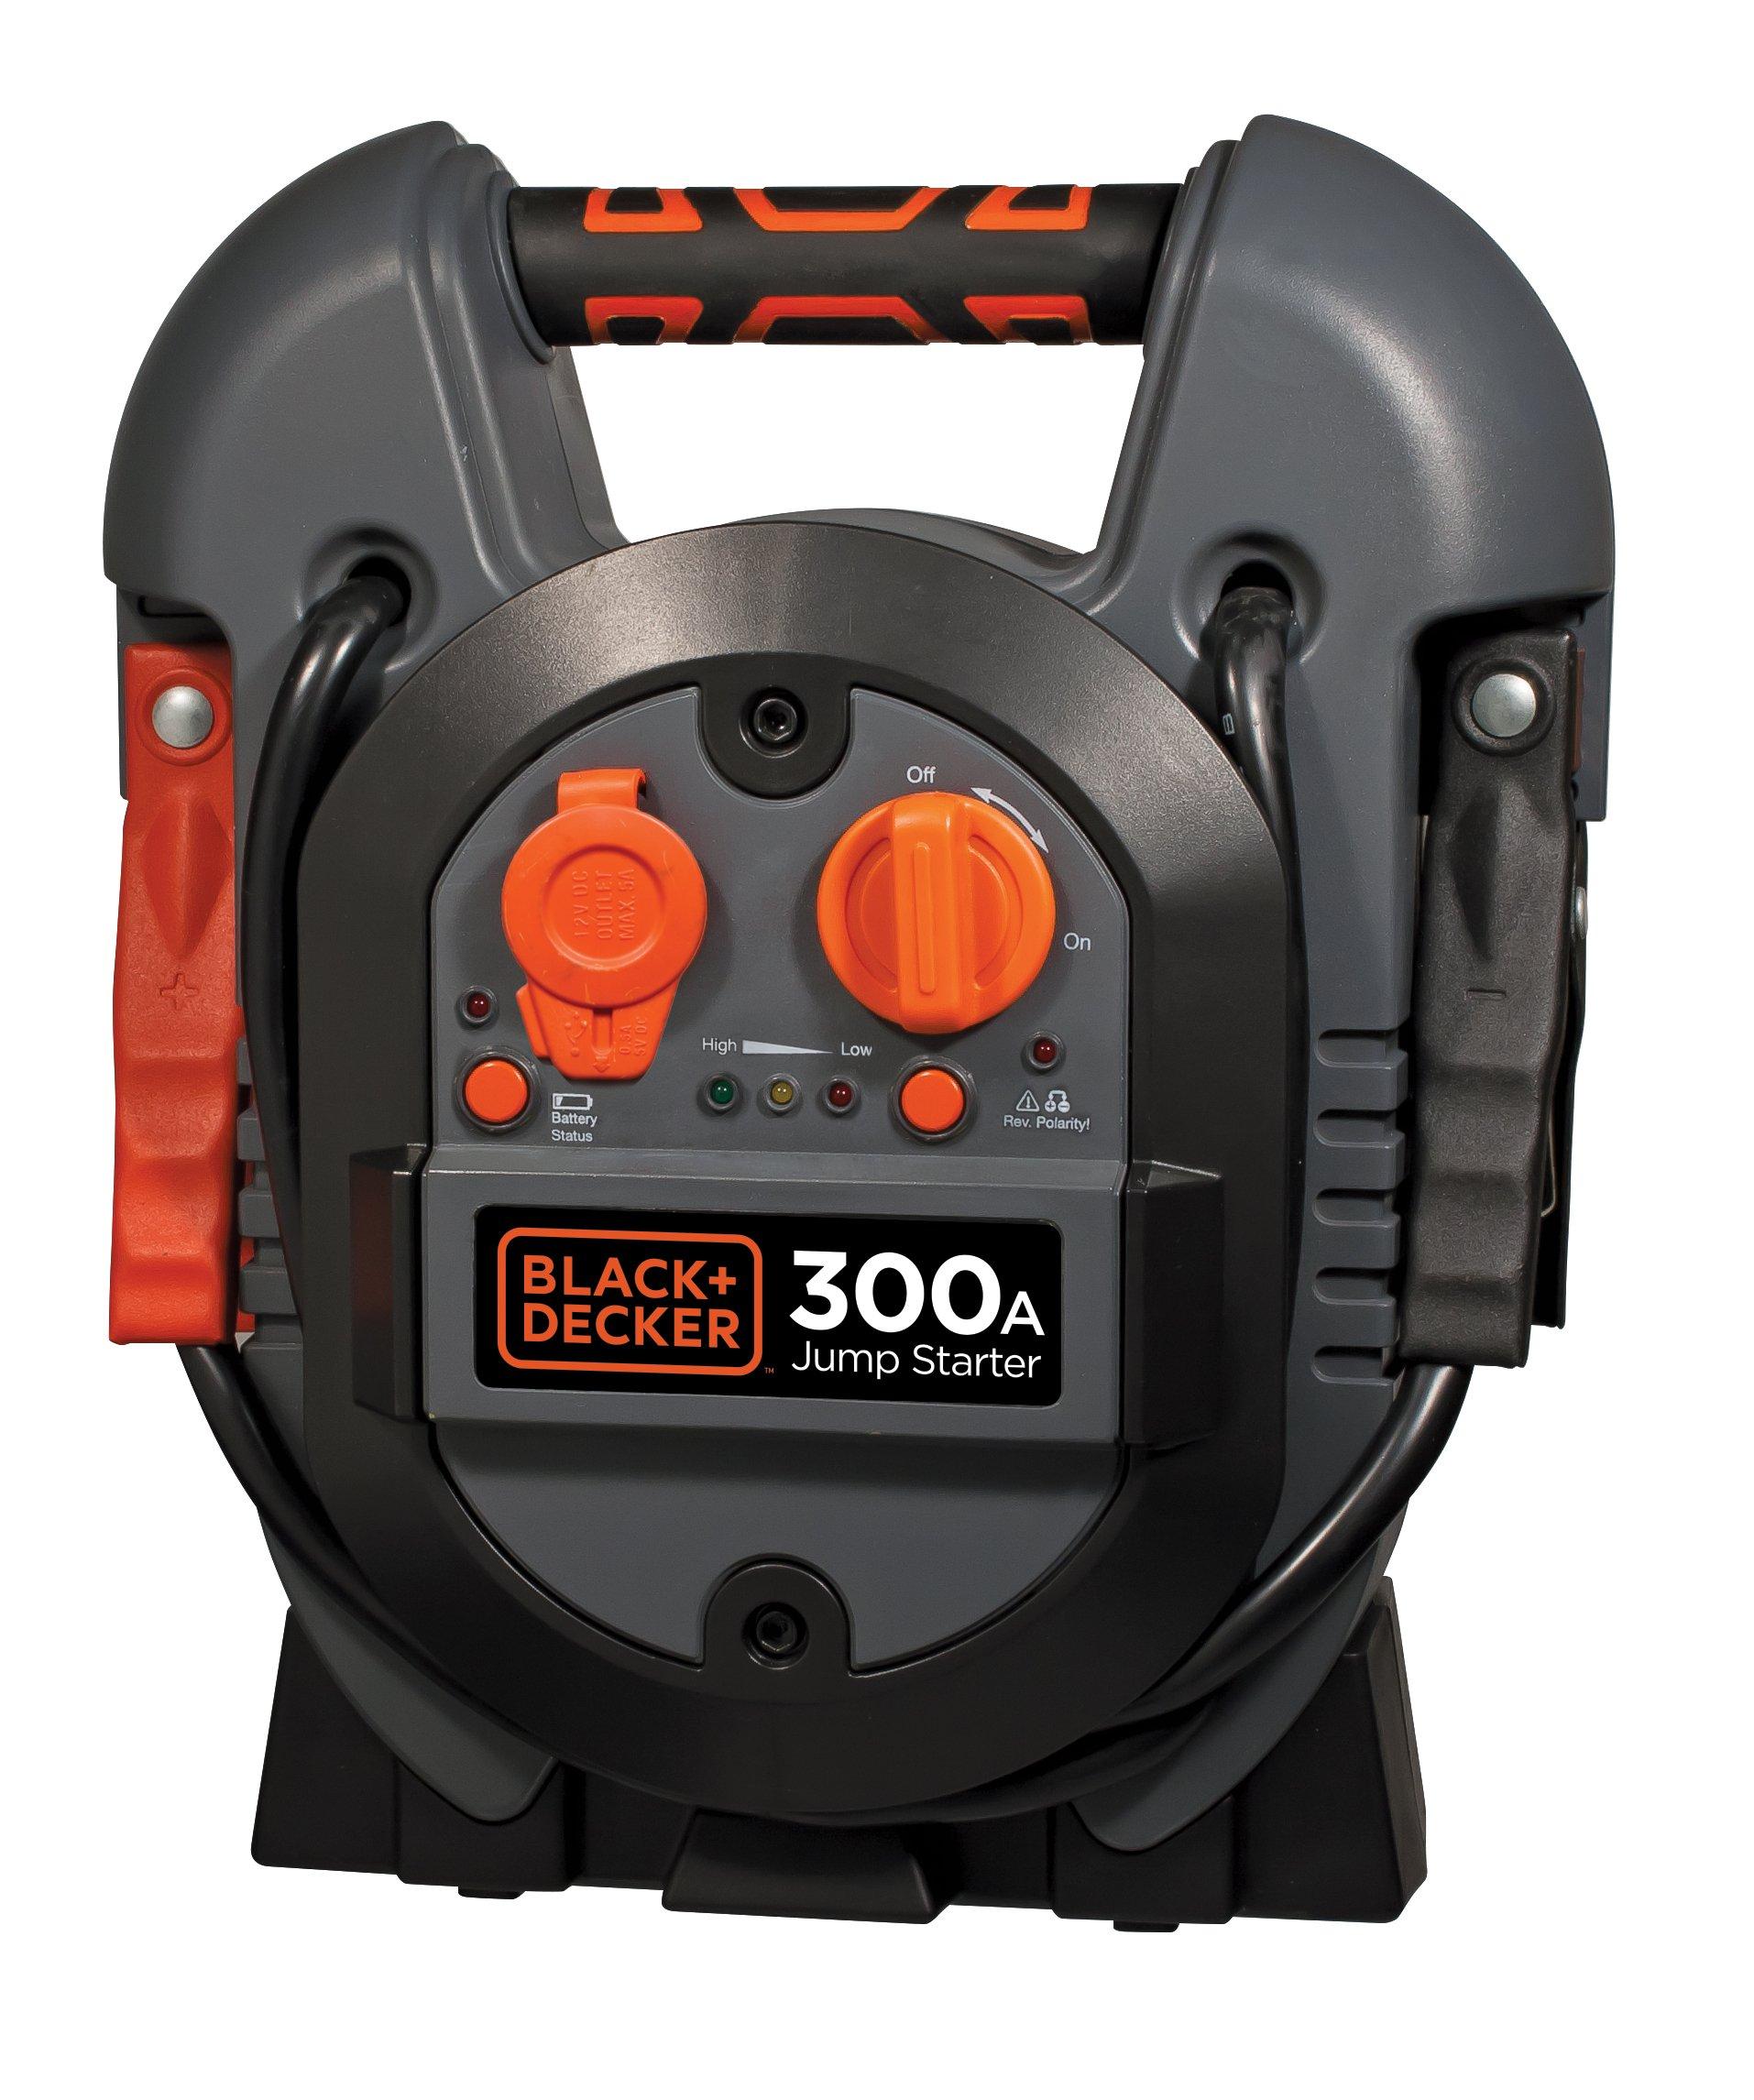 BLACK+DECKER J312B Jump Starter: 600 Peak/300 Instant Amps by BLACK+DECKER (Image #1)